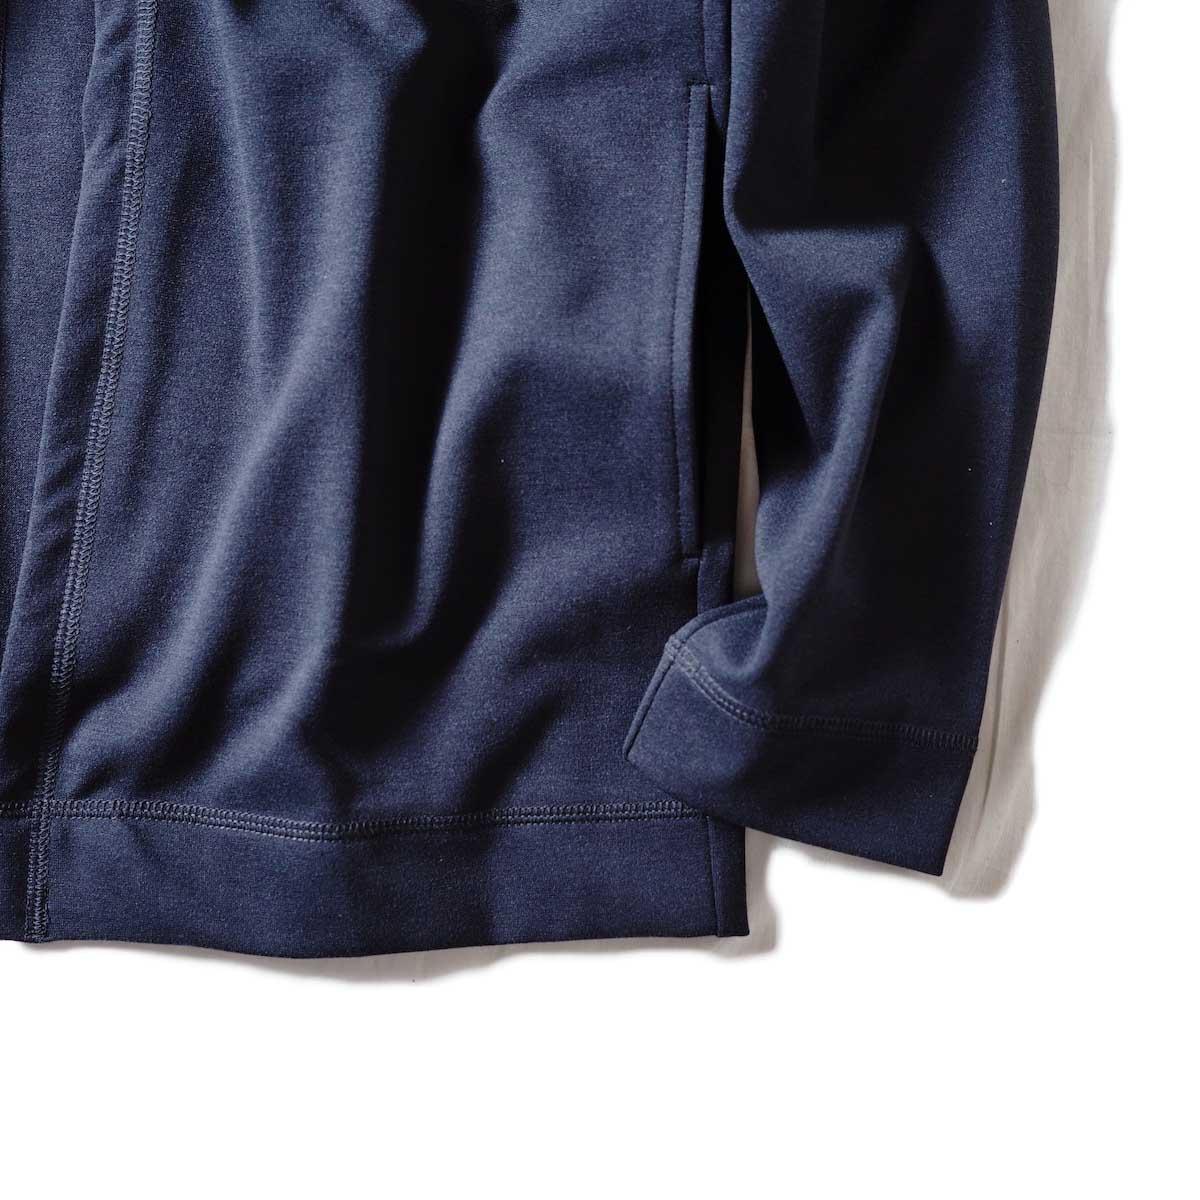 N.HOOLYWOOD / 18RCH-090 SHORT CARDIGAN (Chacoal)袖、裾